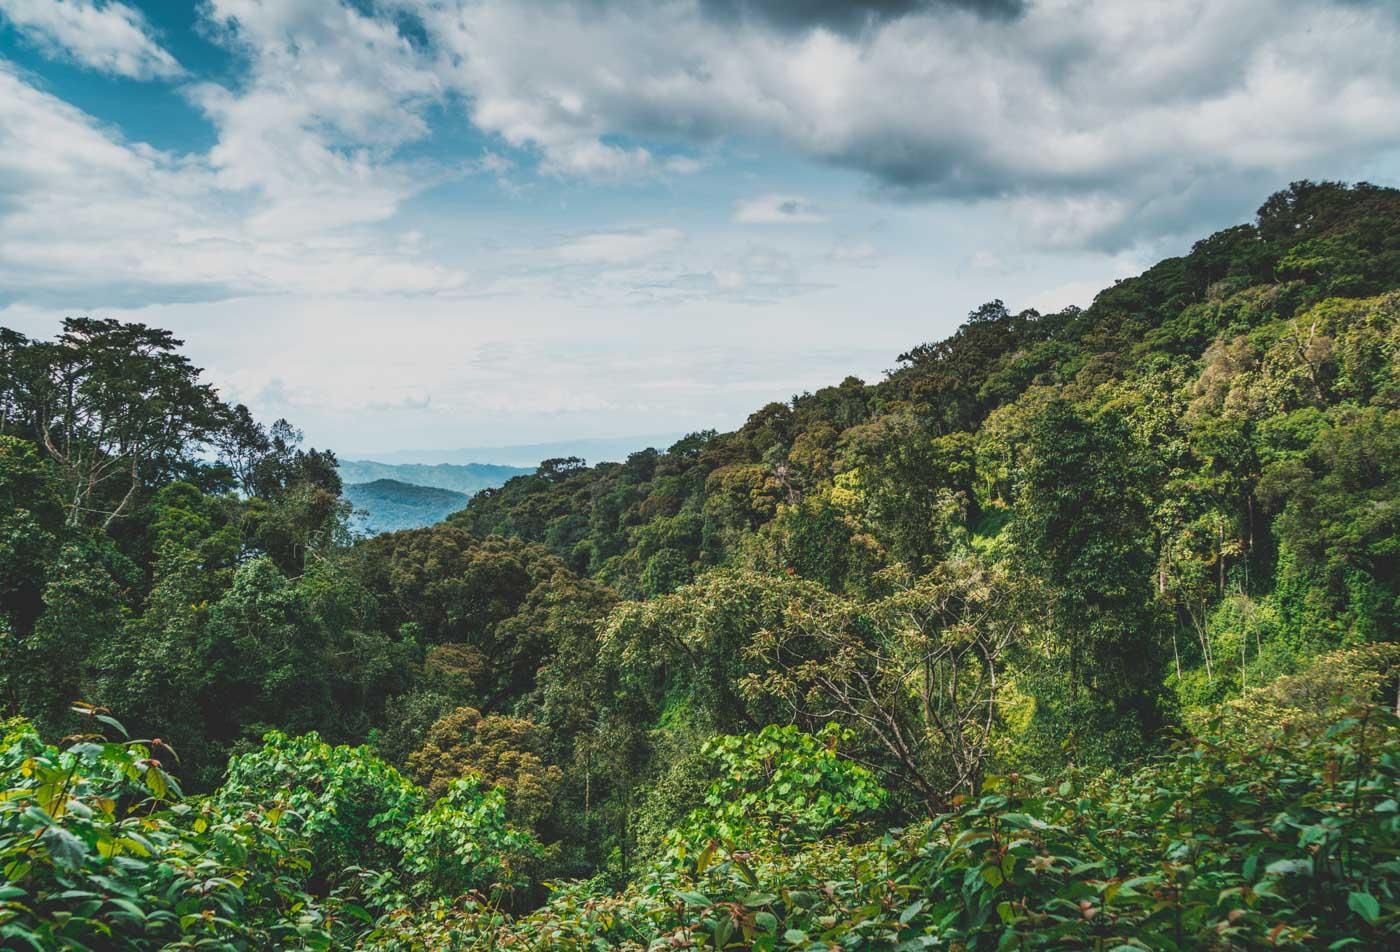 Traveling to Rwanda: Rwanda - the land of a thousand hills